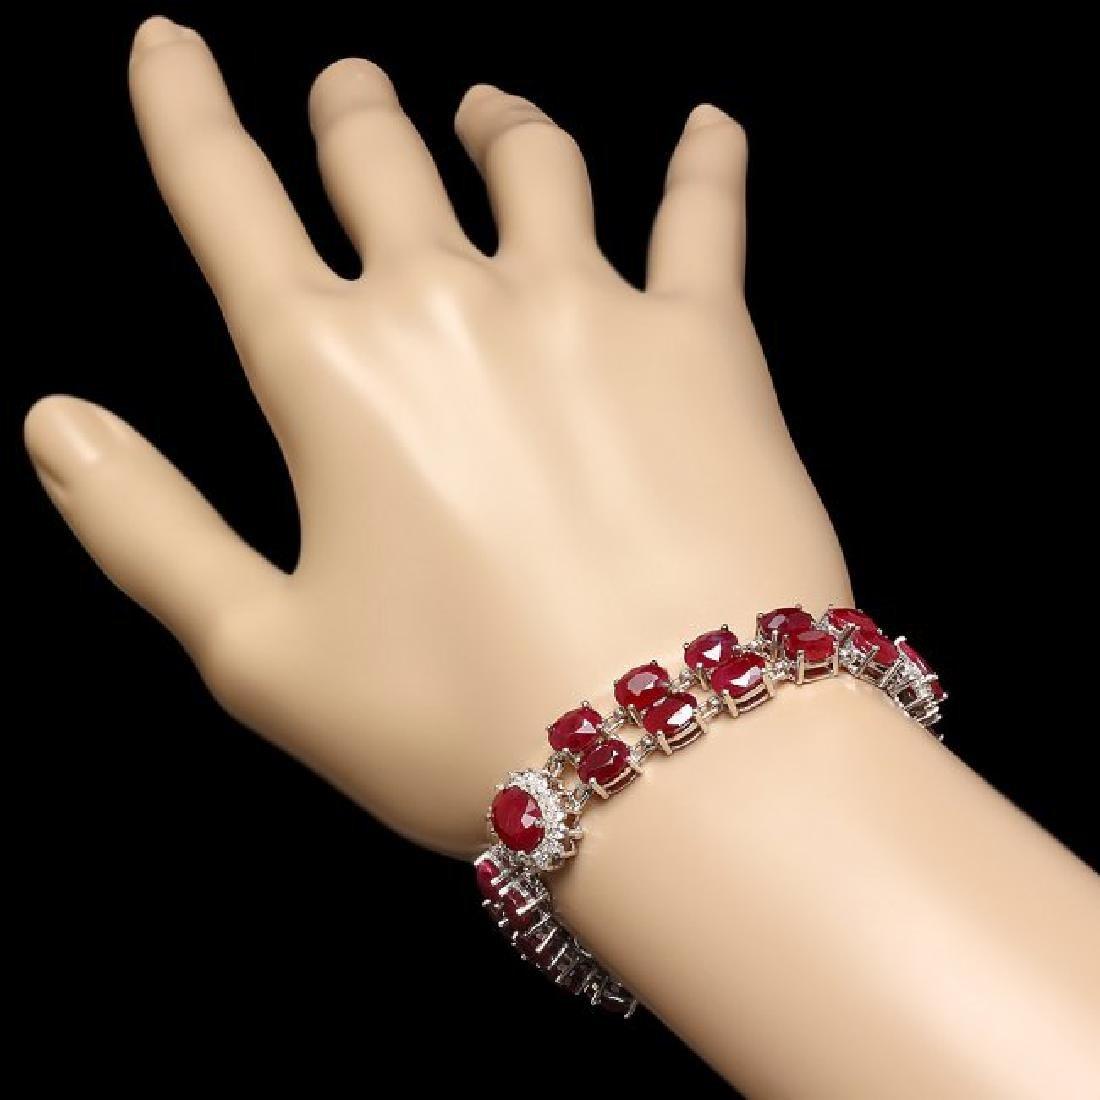 14k White Gold 43ct Ruby 1.65ct Diamond Bracelet - 3